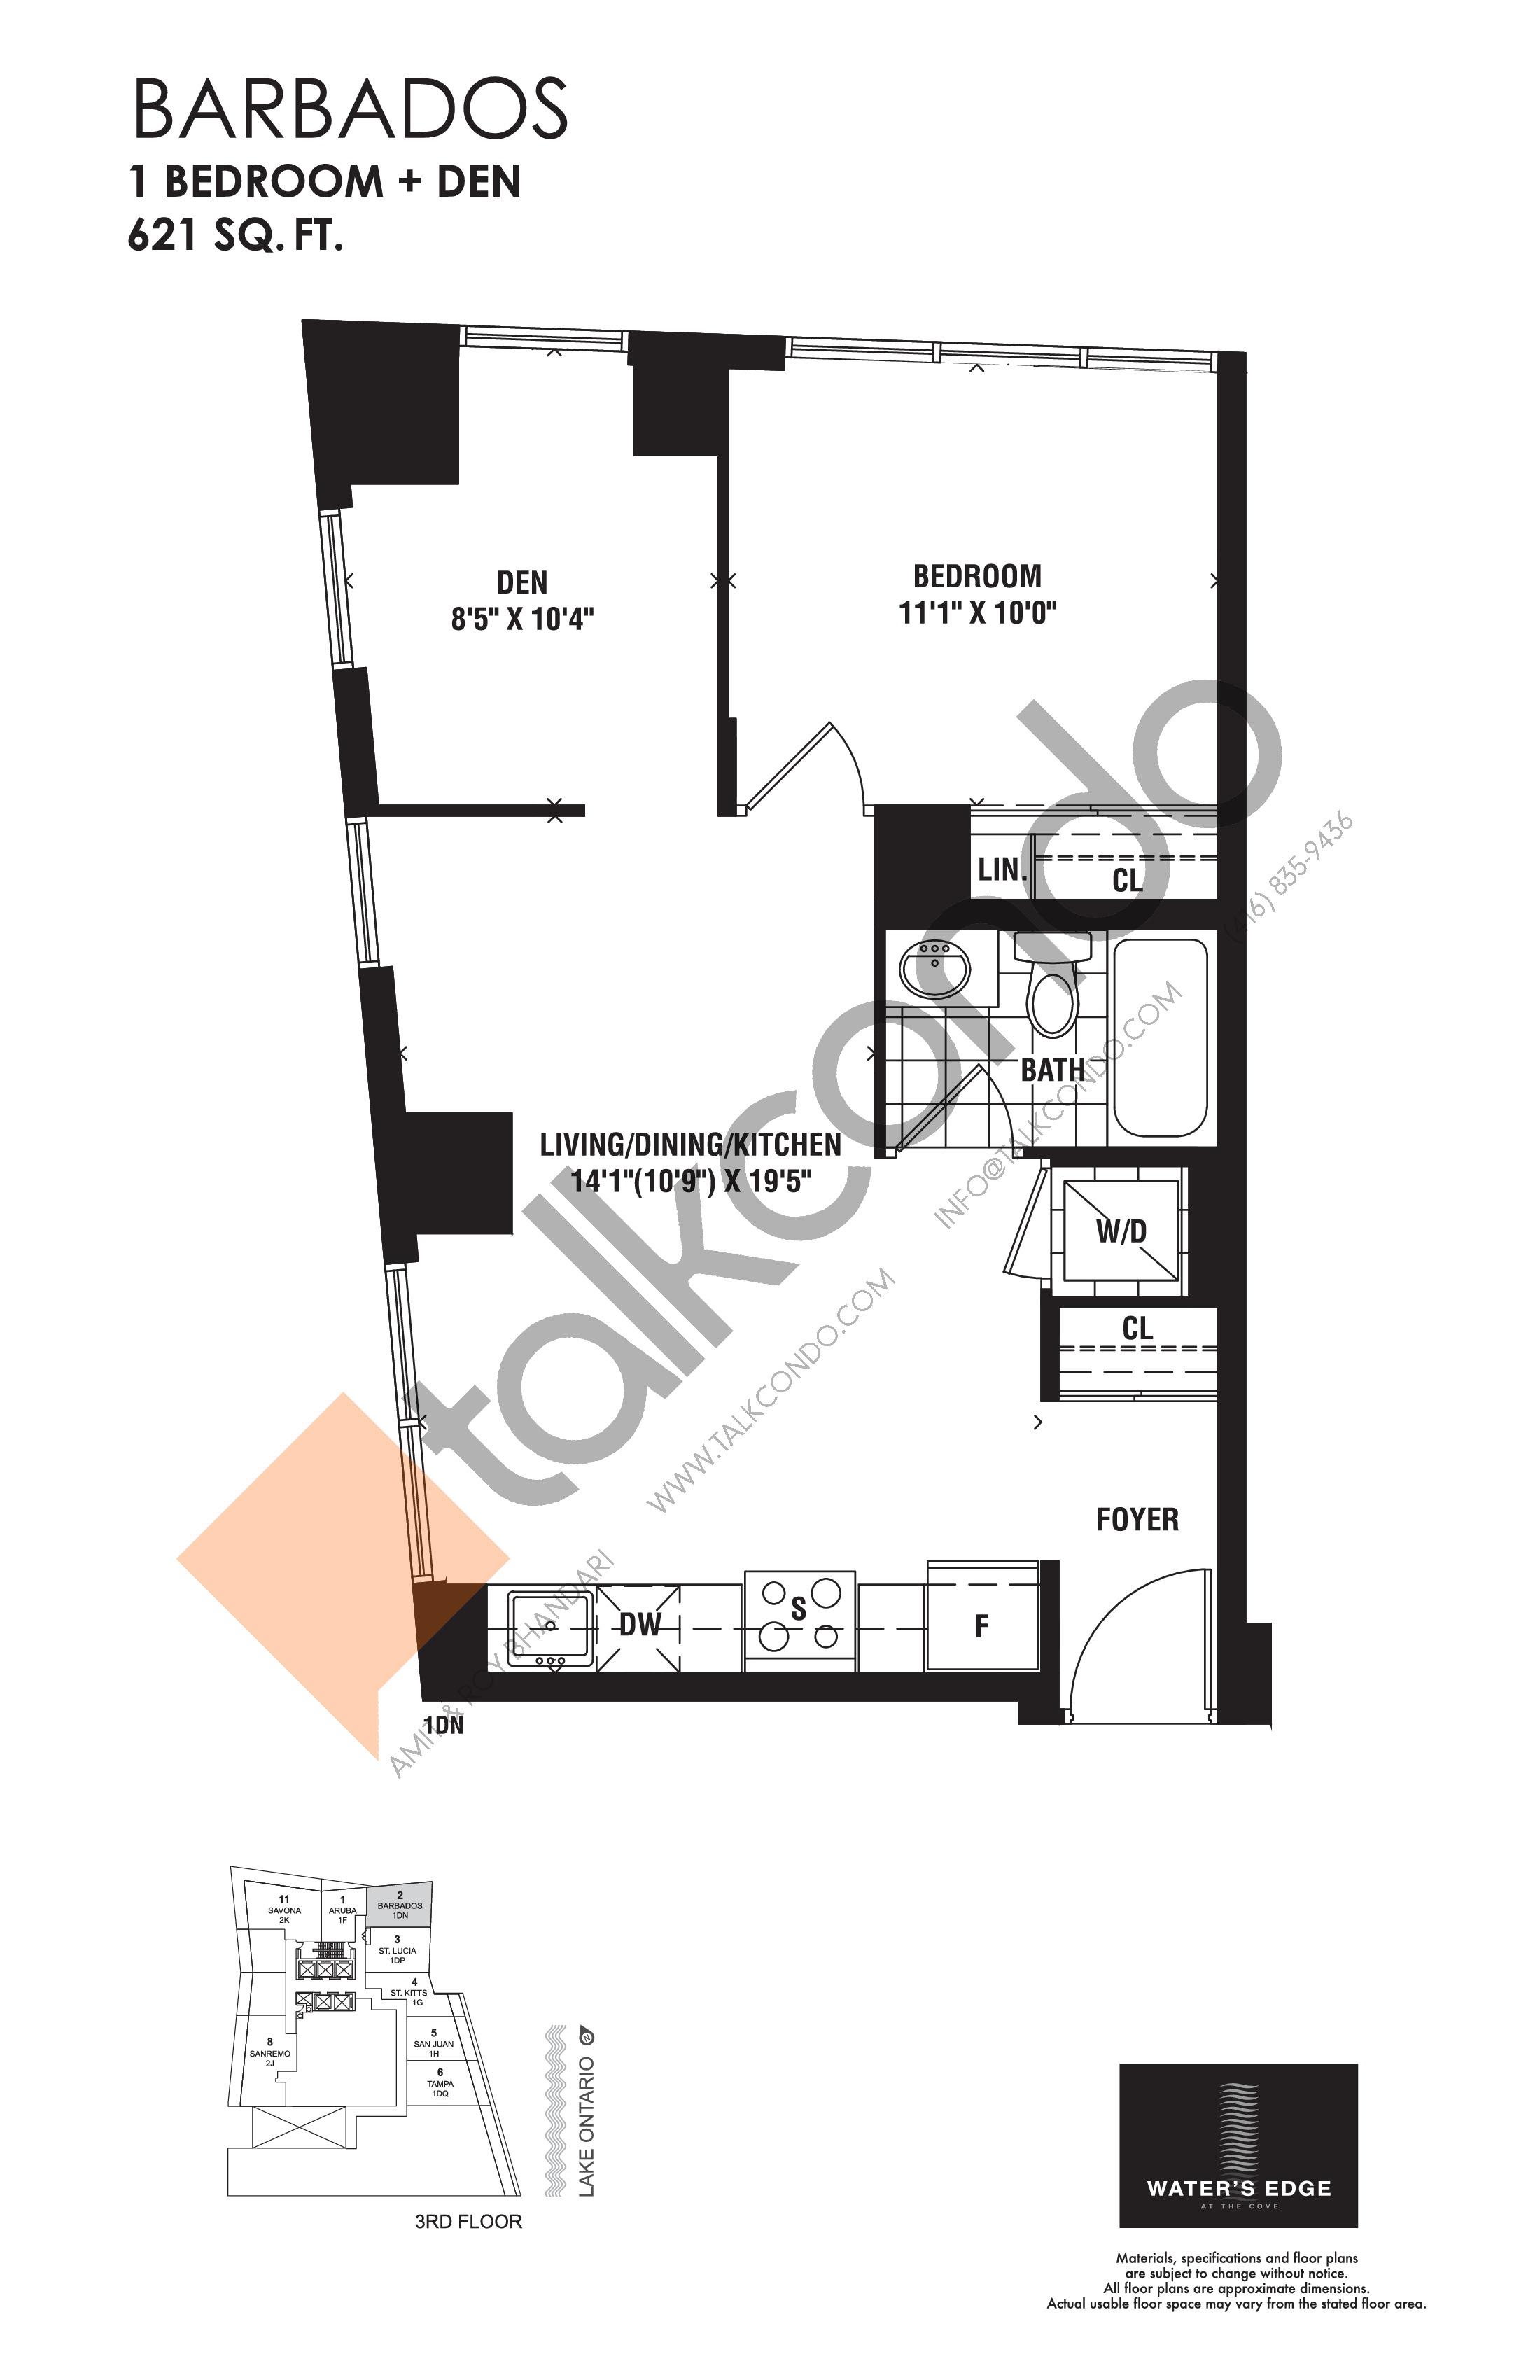 Barbados Floor Plan at Water's Edge at the Cove Condos - 621 sq.ft